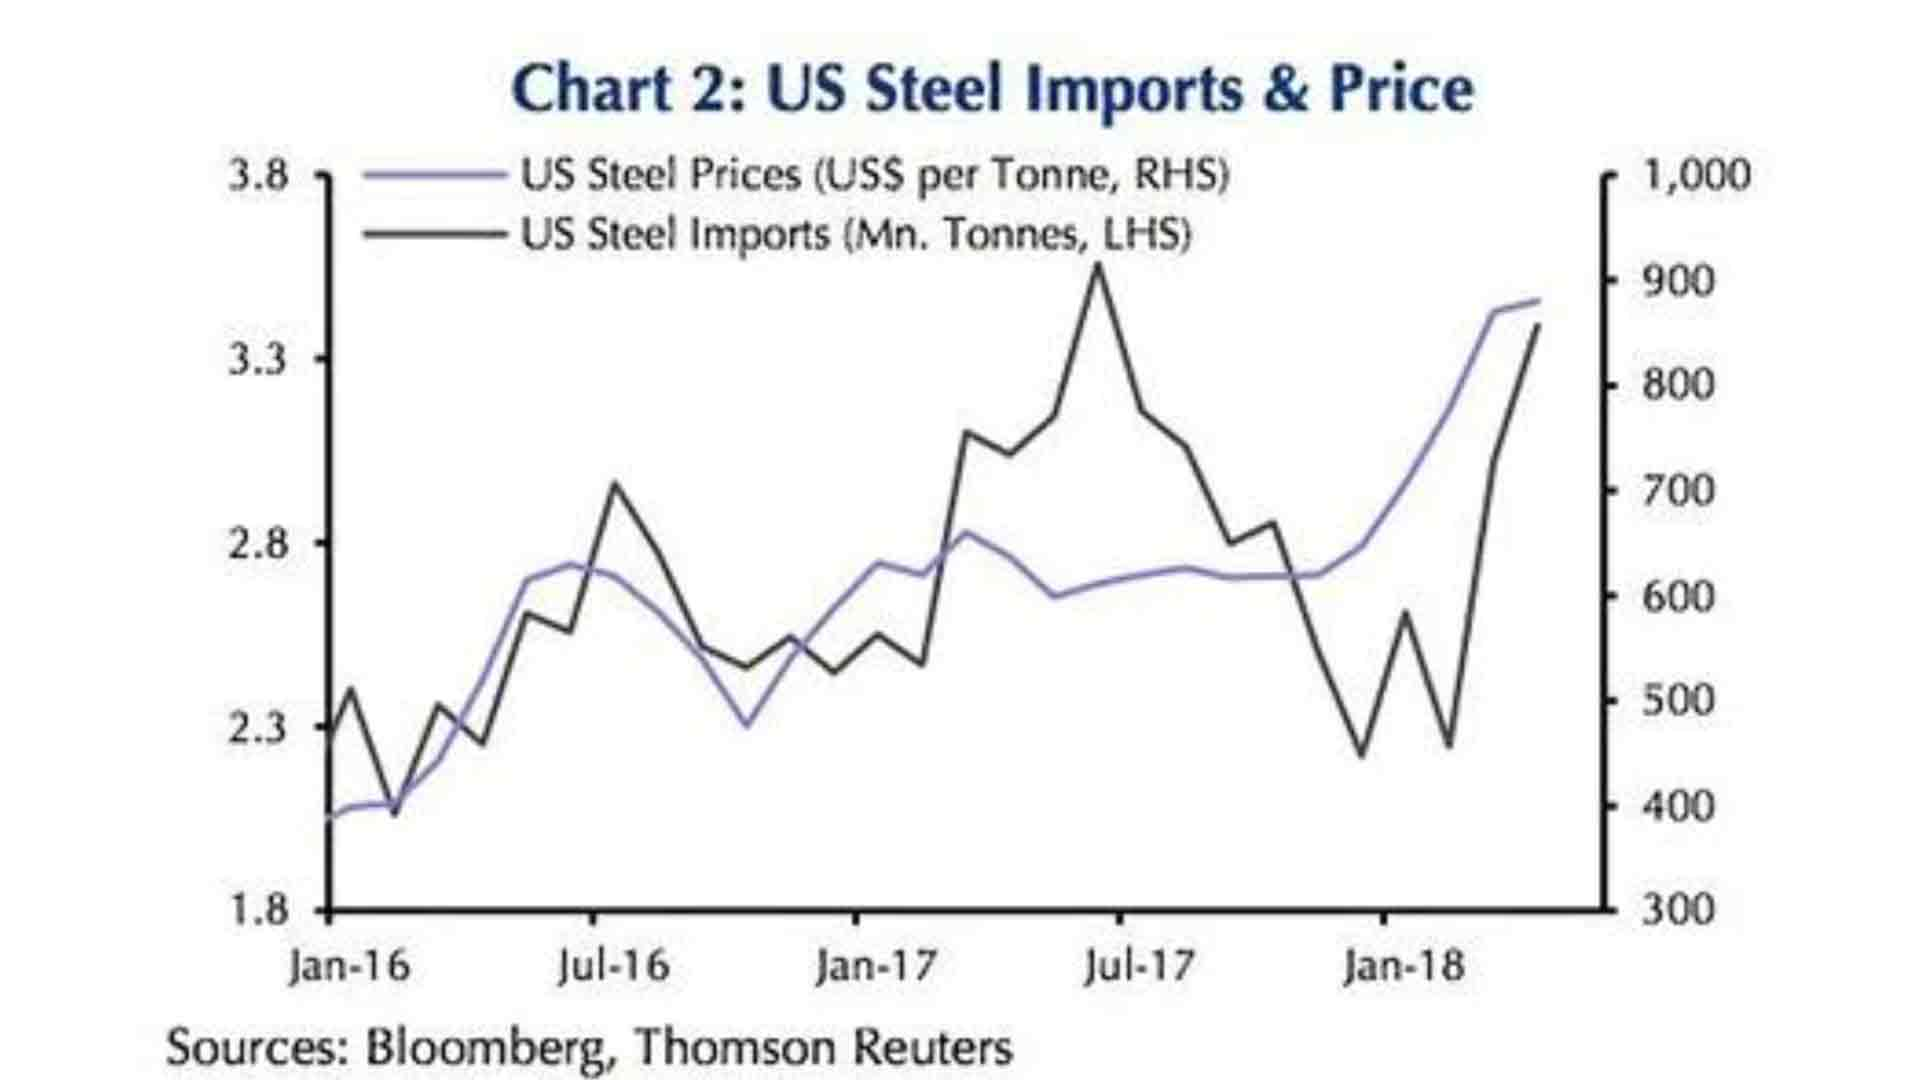 metal-deck-cost-us-steel-imports-chart